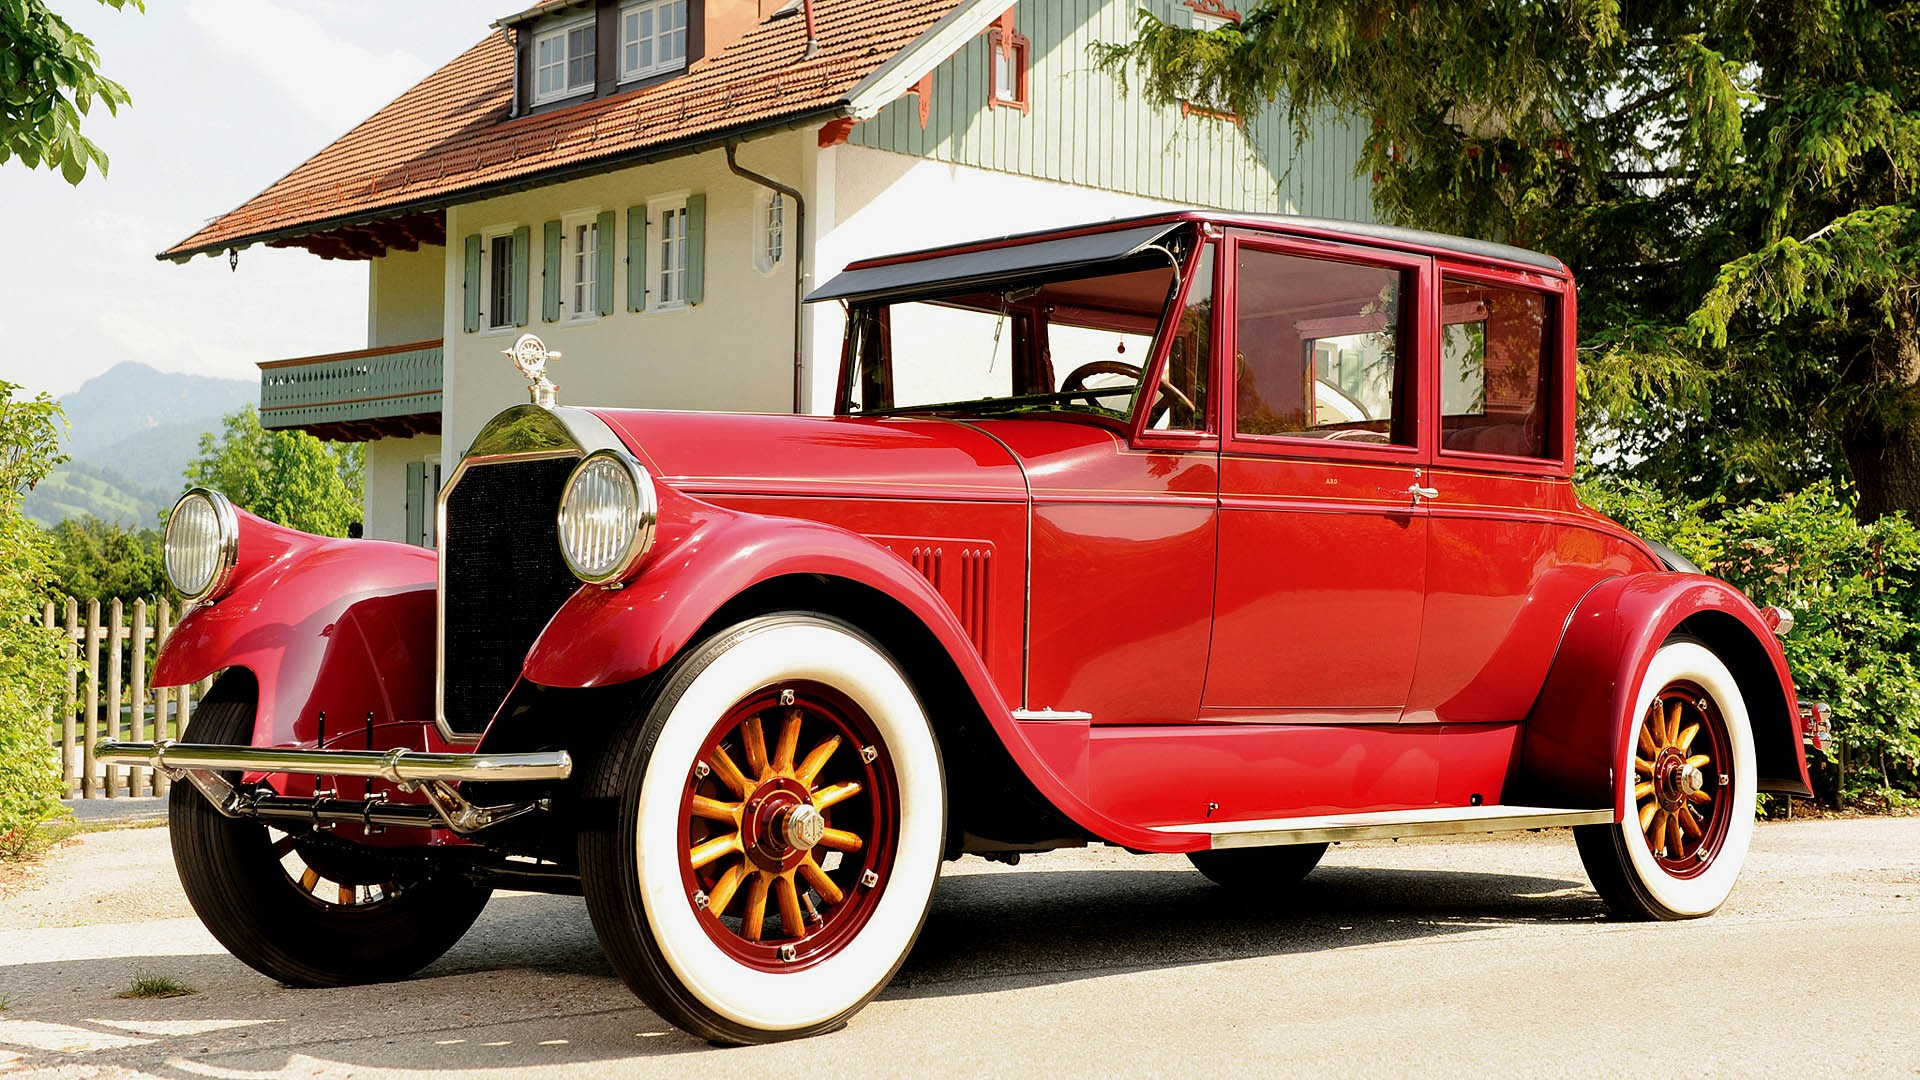 vintage, cars, Classic - Free Wallpaper / WallpaperJam.com